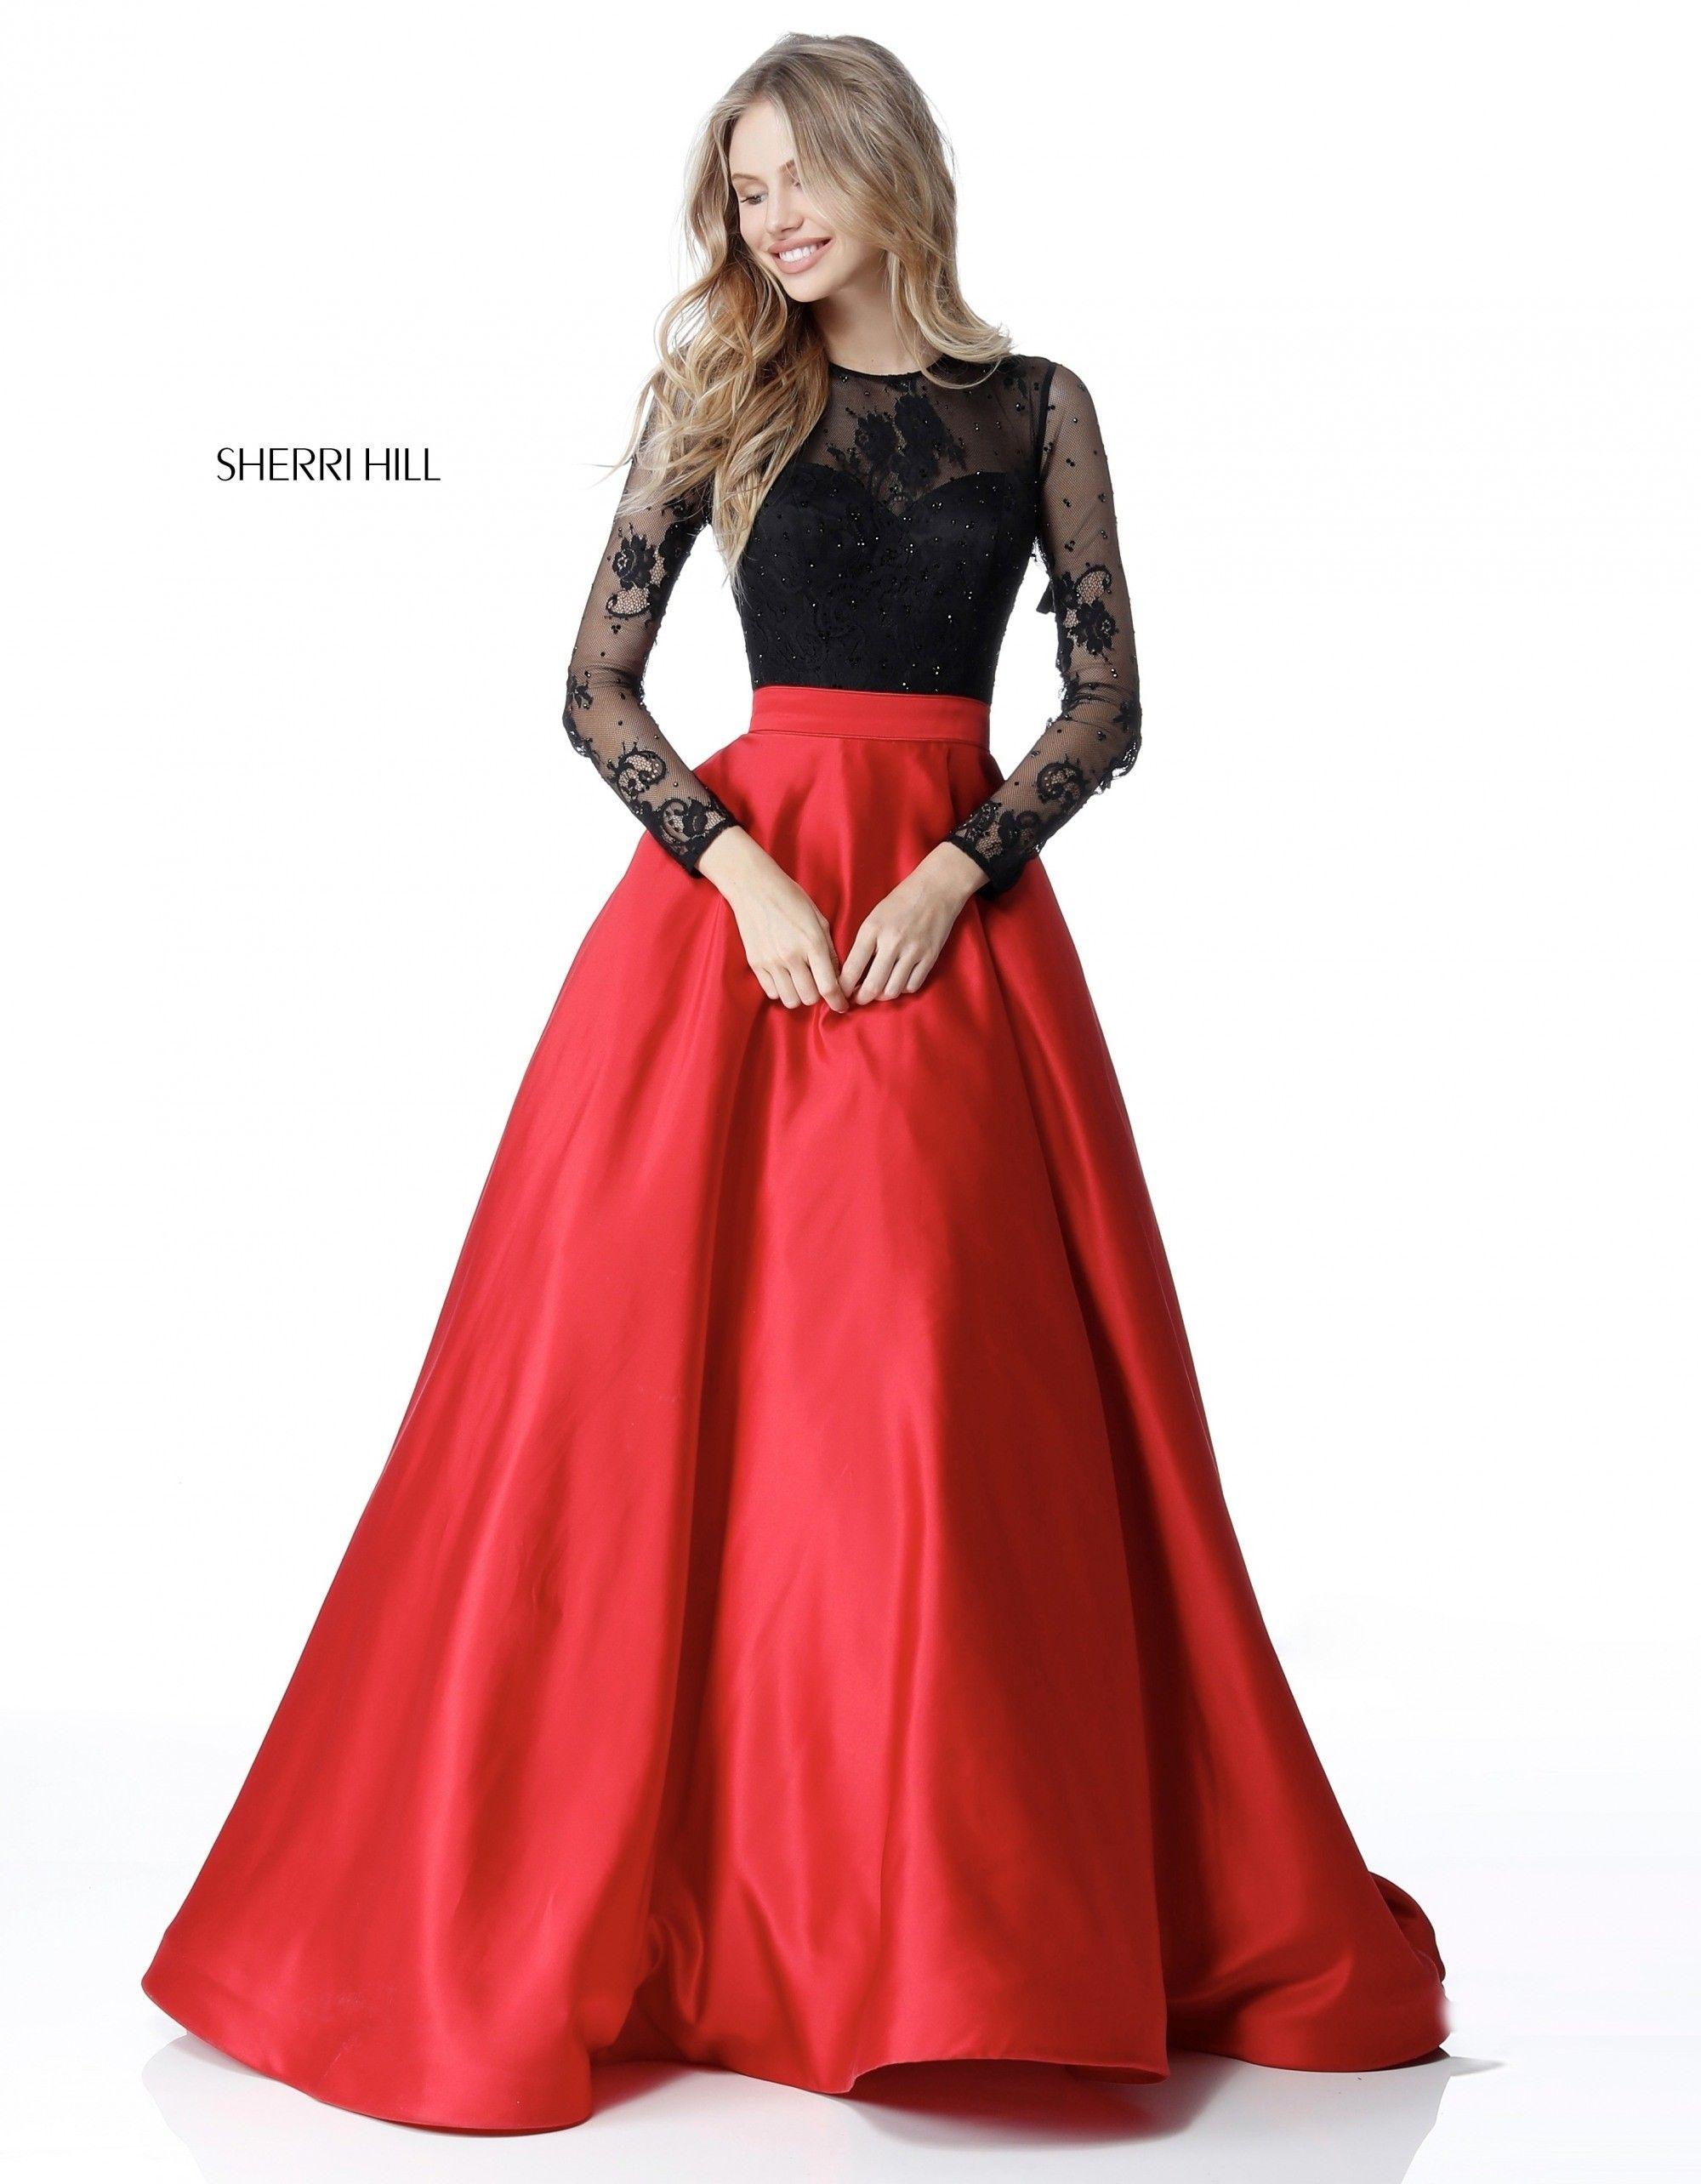 Sherri Hill 51586 Long Sleeve Lace Taffeta Ball Gown